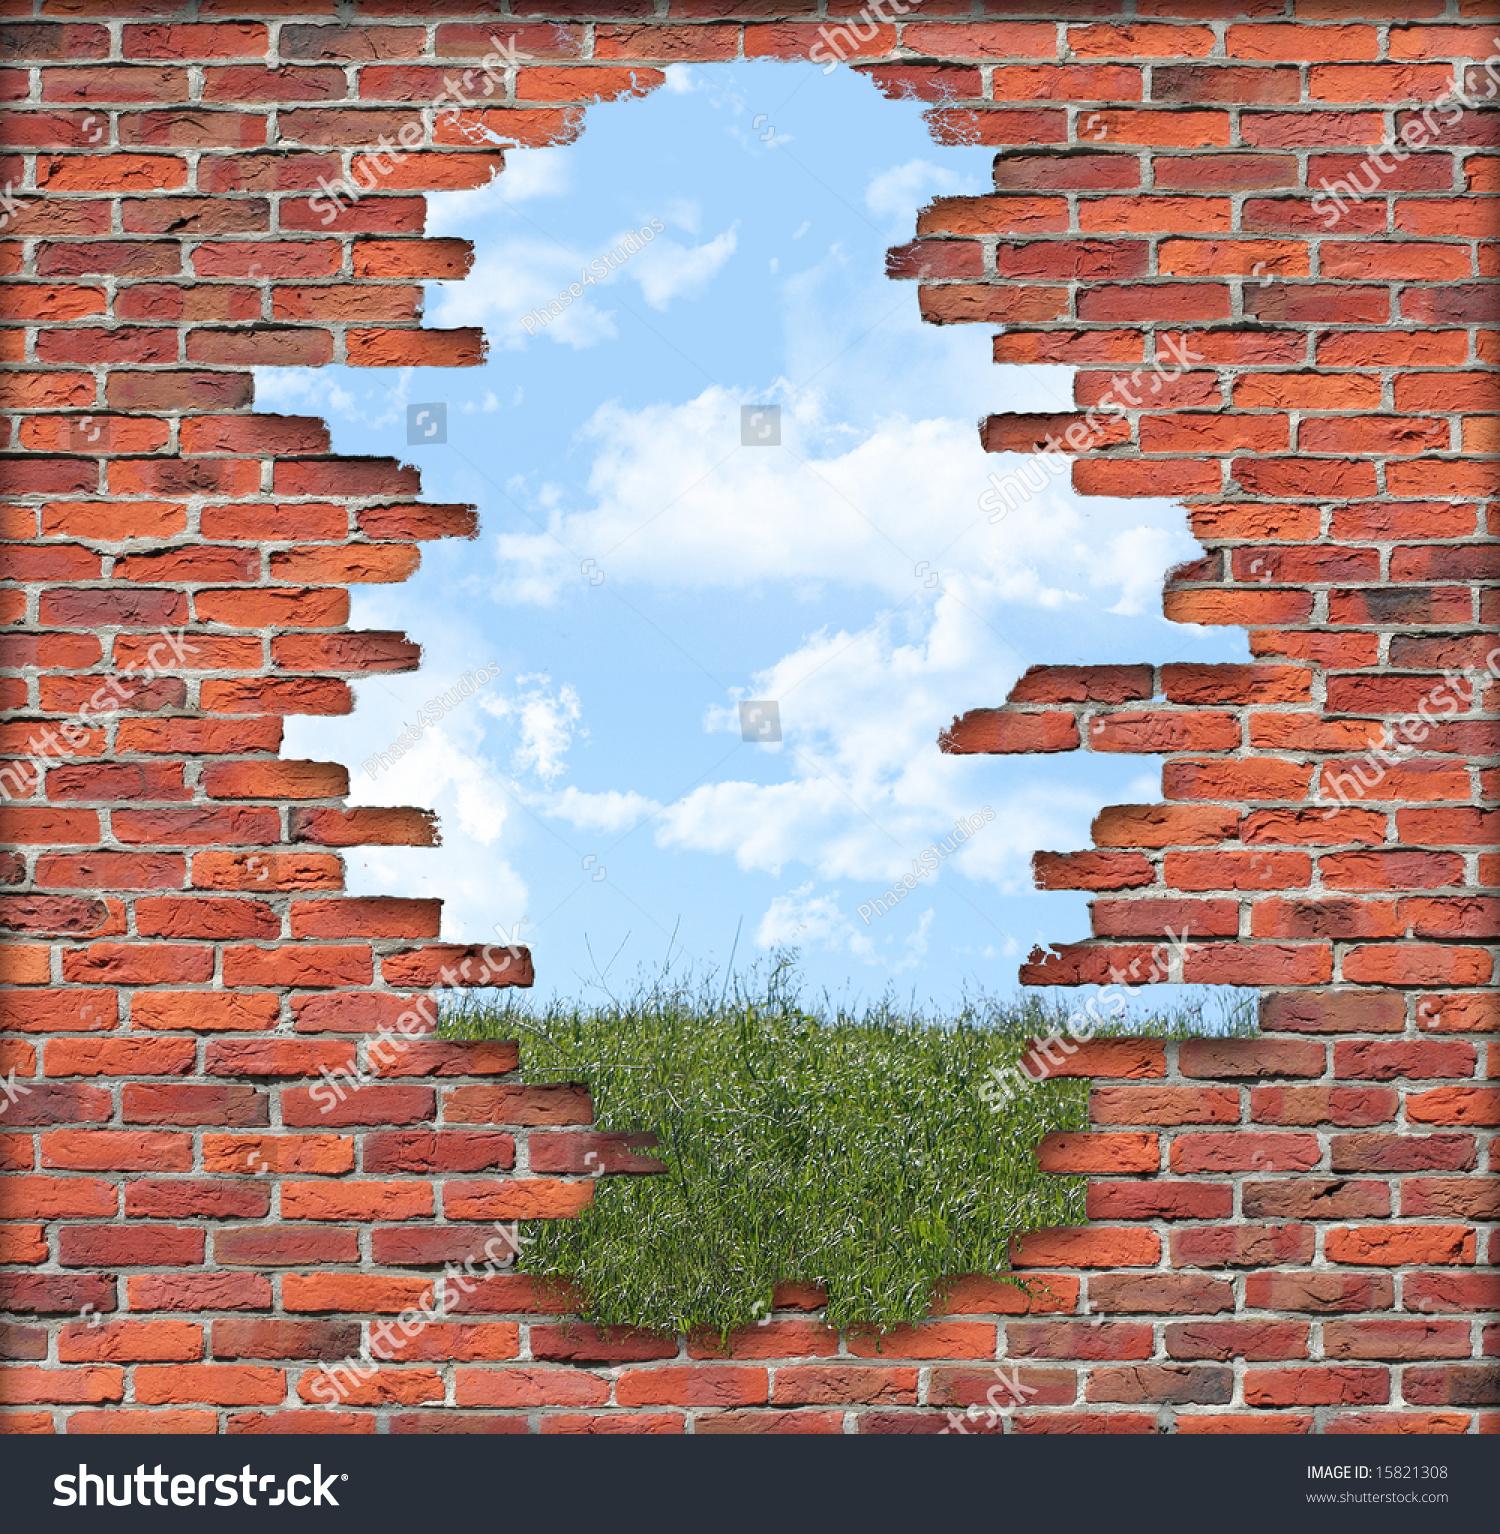 Brick Accent Wall Crumbling: Old Crumbling Brick Wall Front Grassy Stock Photo 15821308